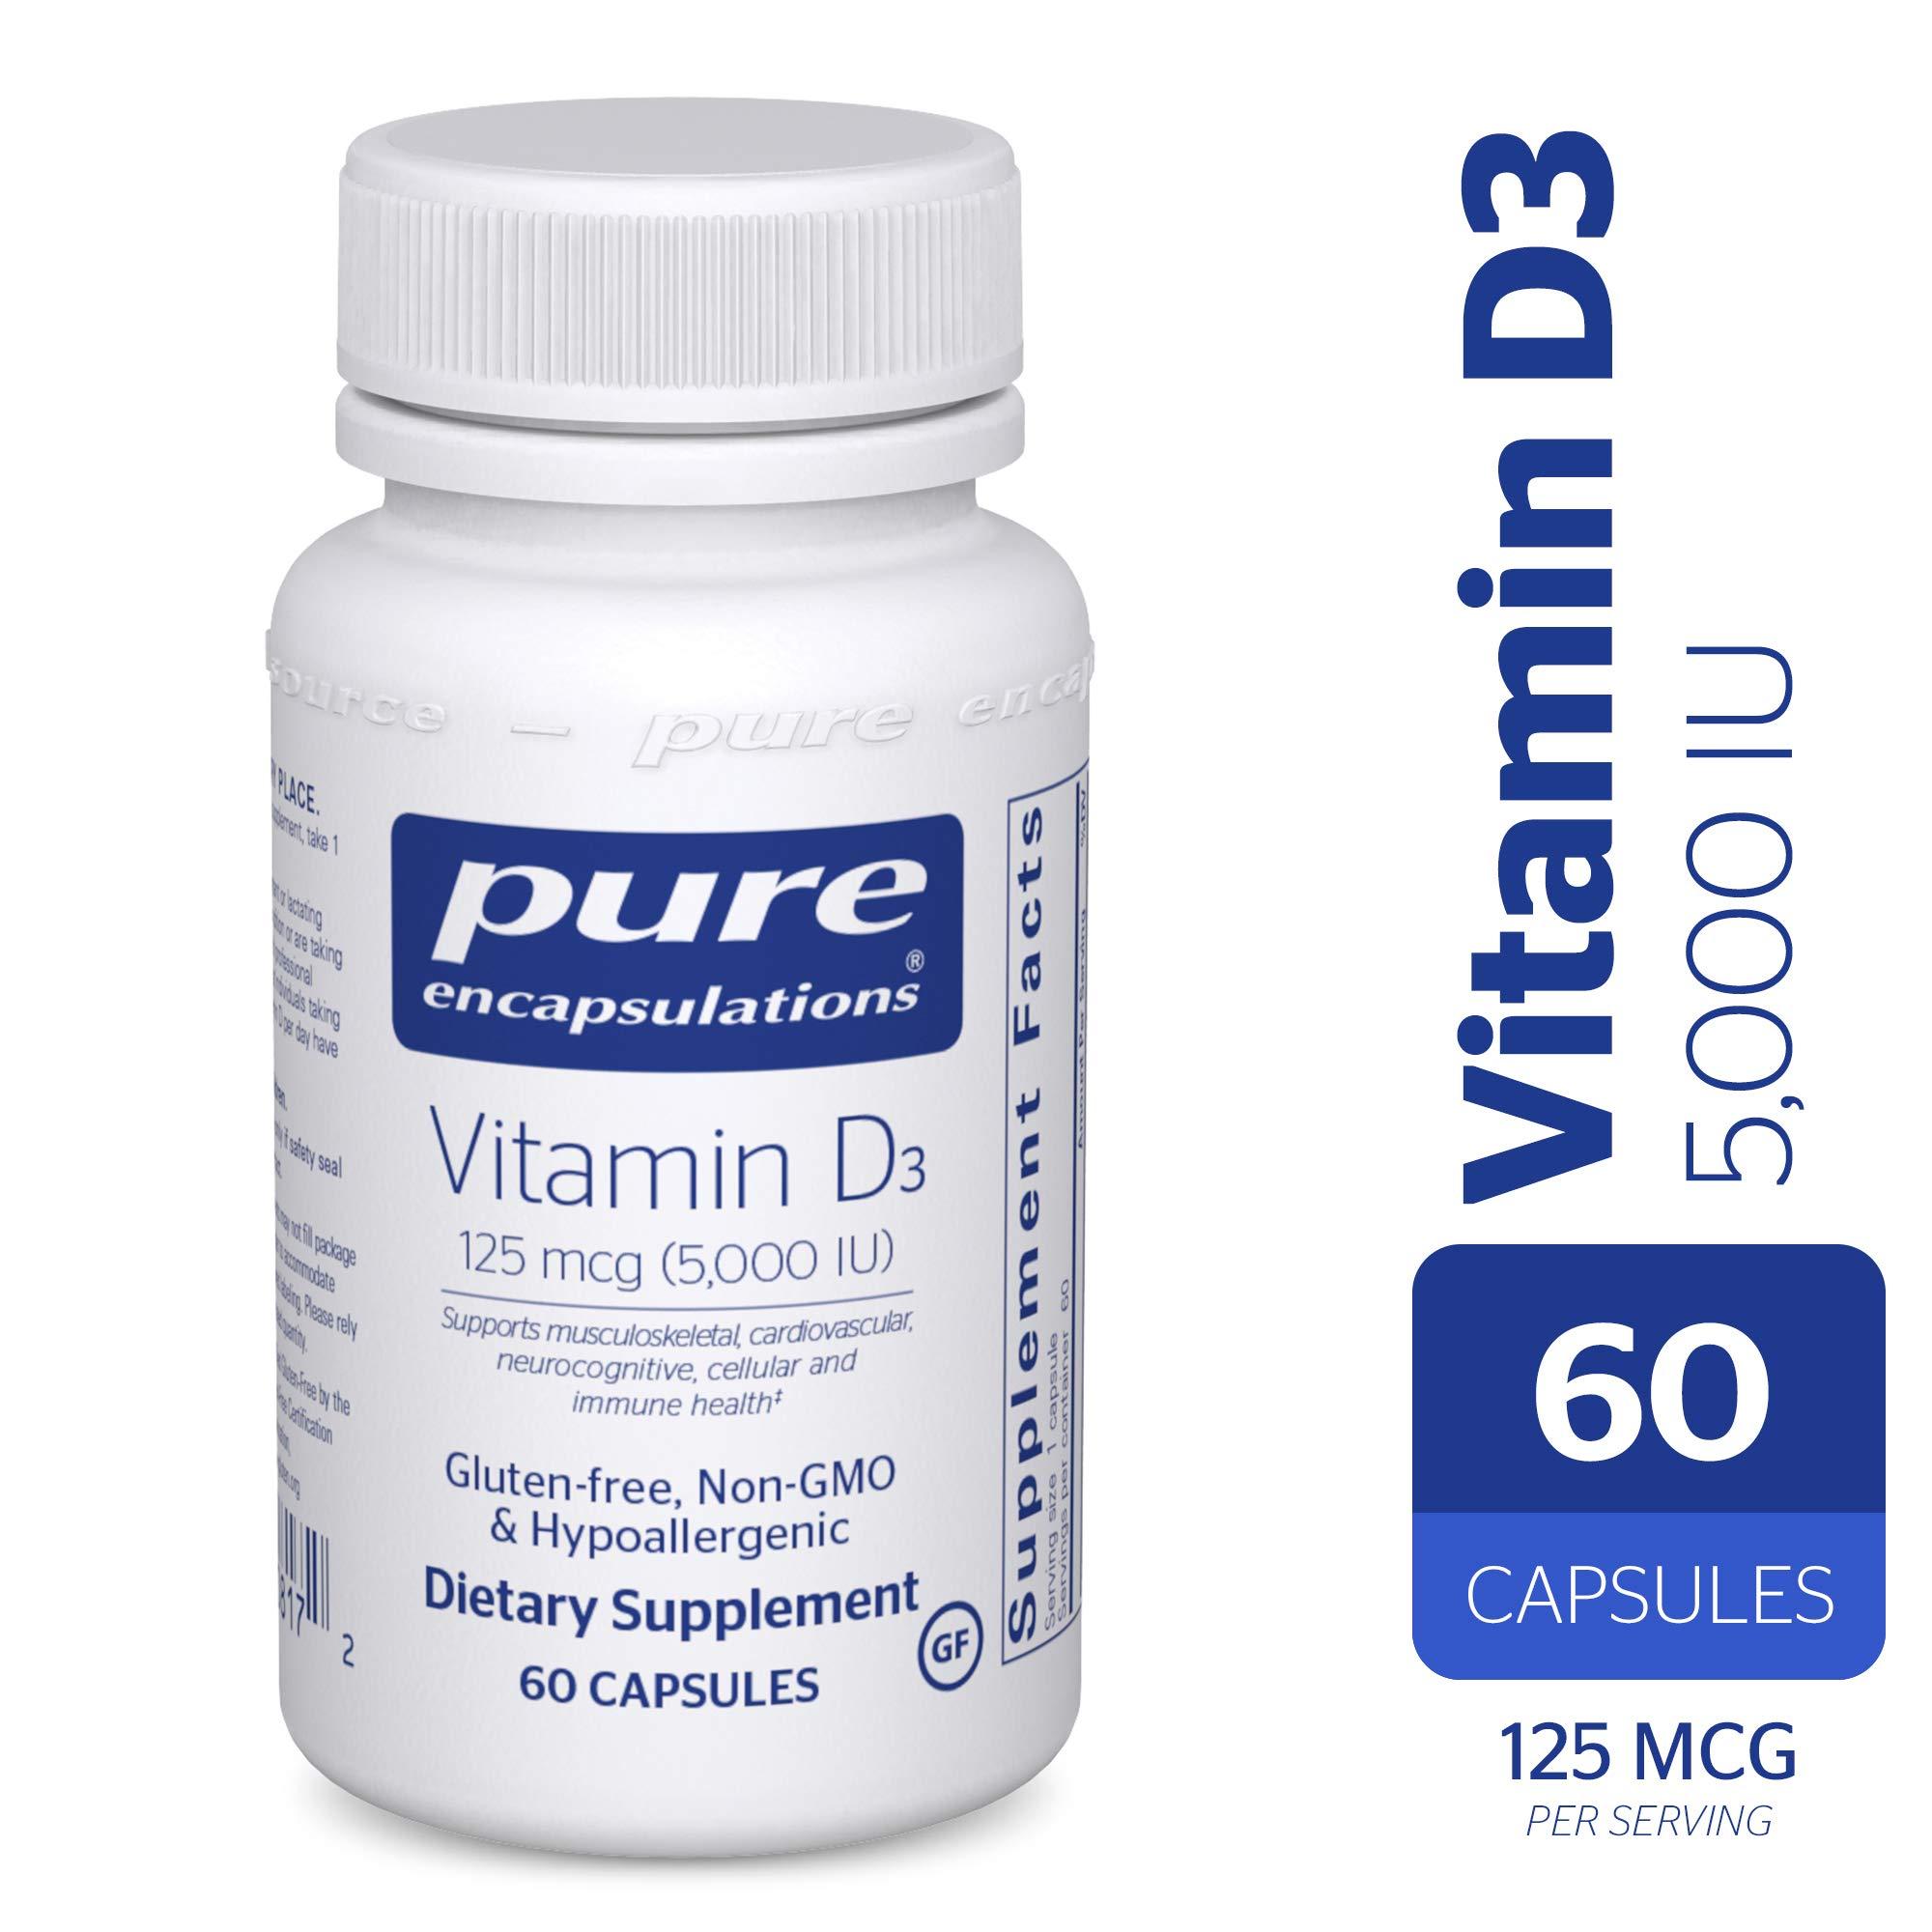 Pure Encapsulations - Vitamin D3 5,000 IU - Hypoallergenic Support for Bone, Breast, Prostate, Cardiovascular, Colon and Immune Health* - 60 Capsules